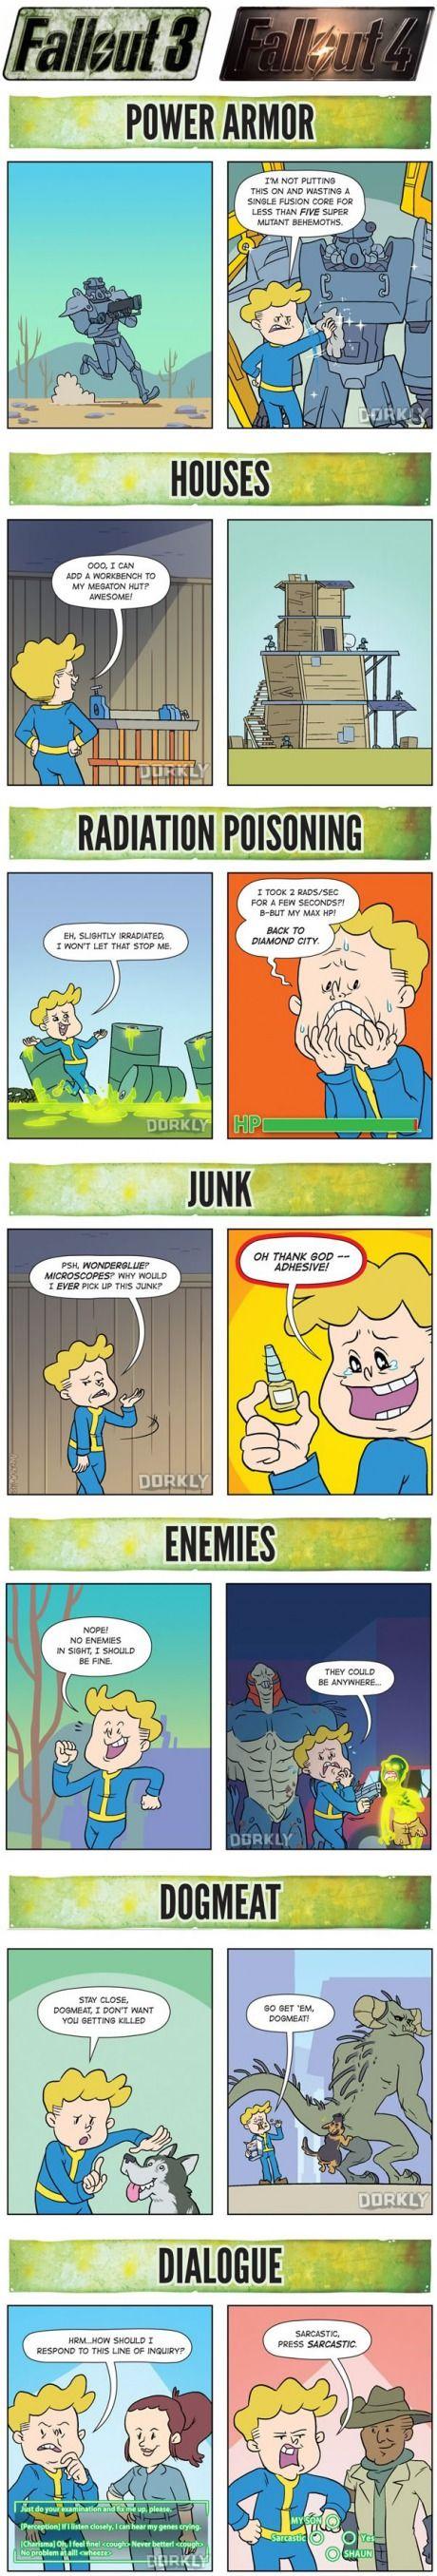 Fallout 3 vs. Fallout 4